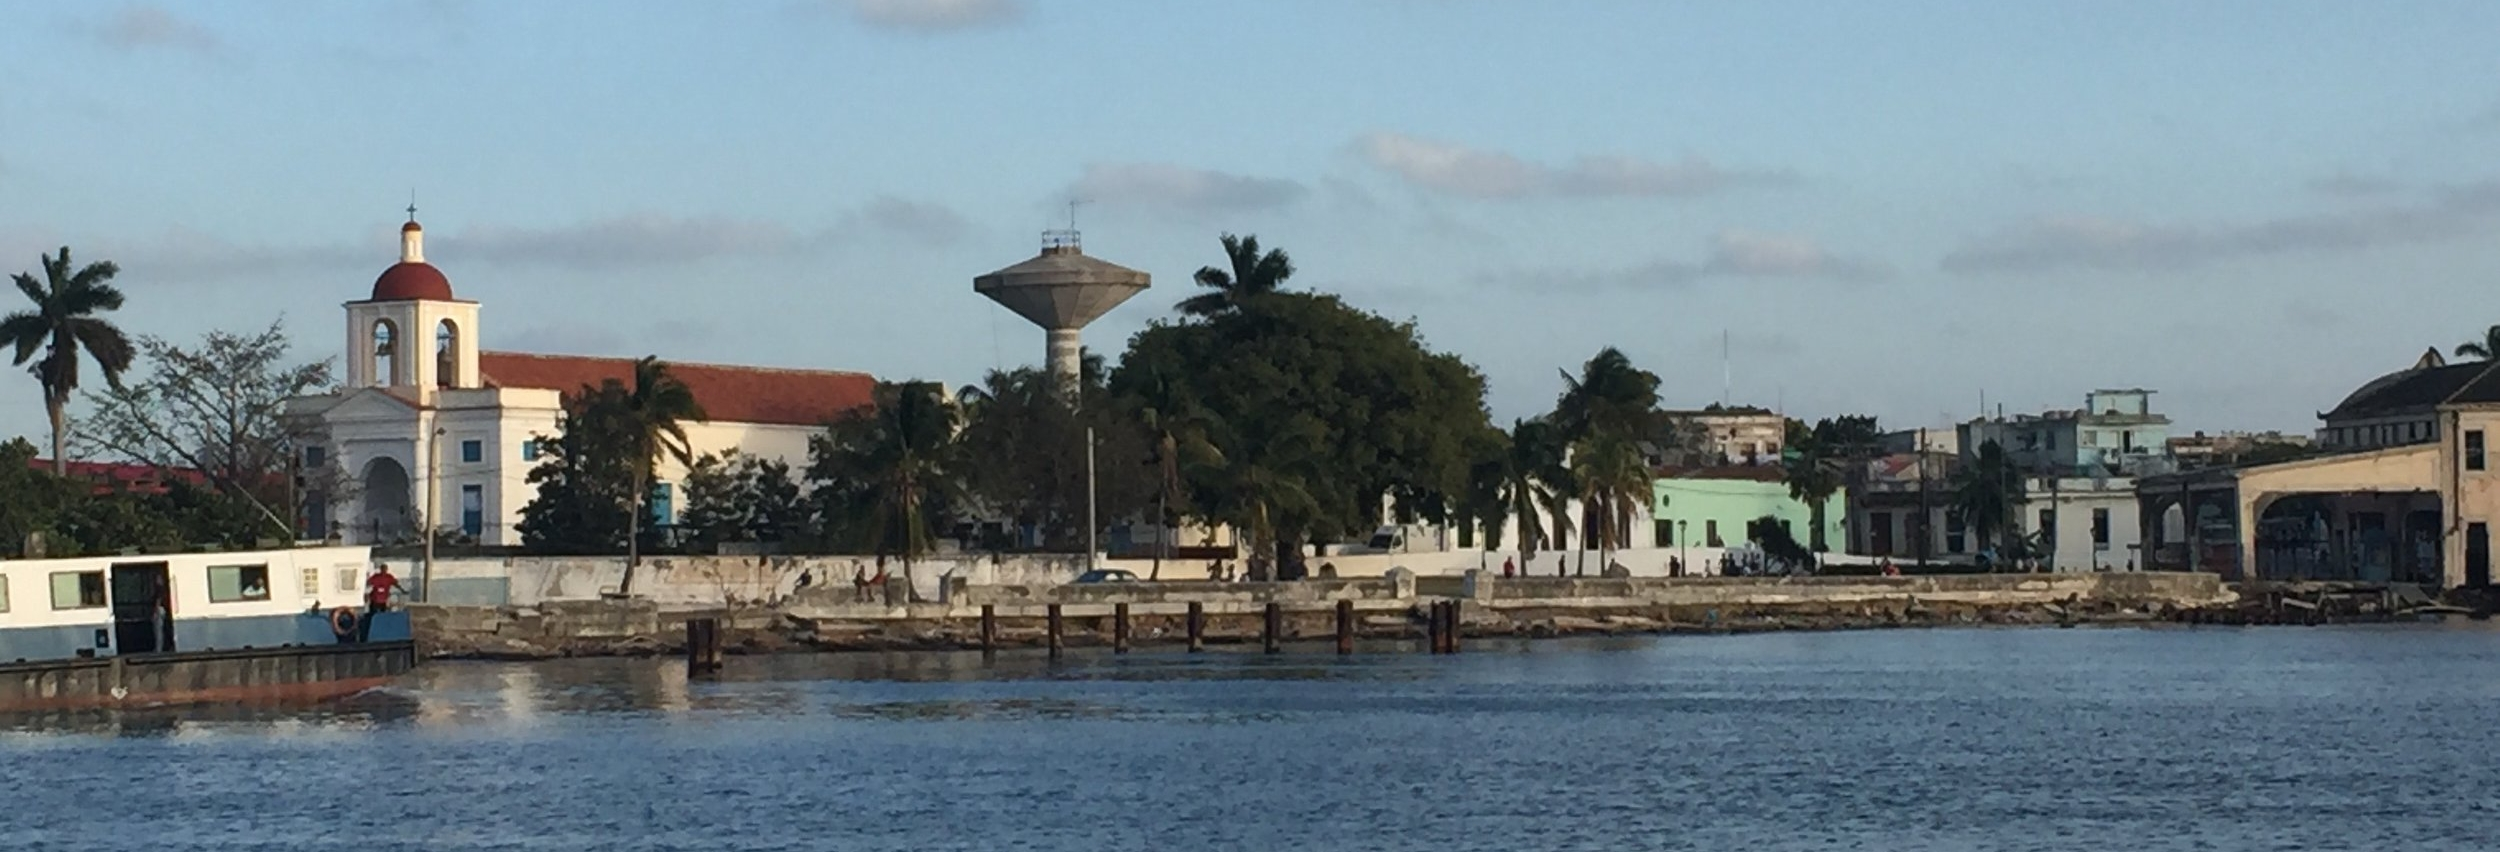 Regla, Habana, Cuba